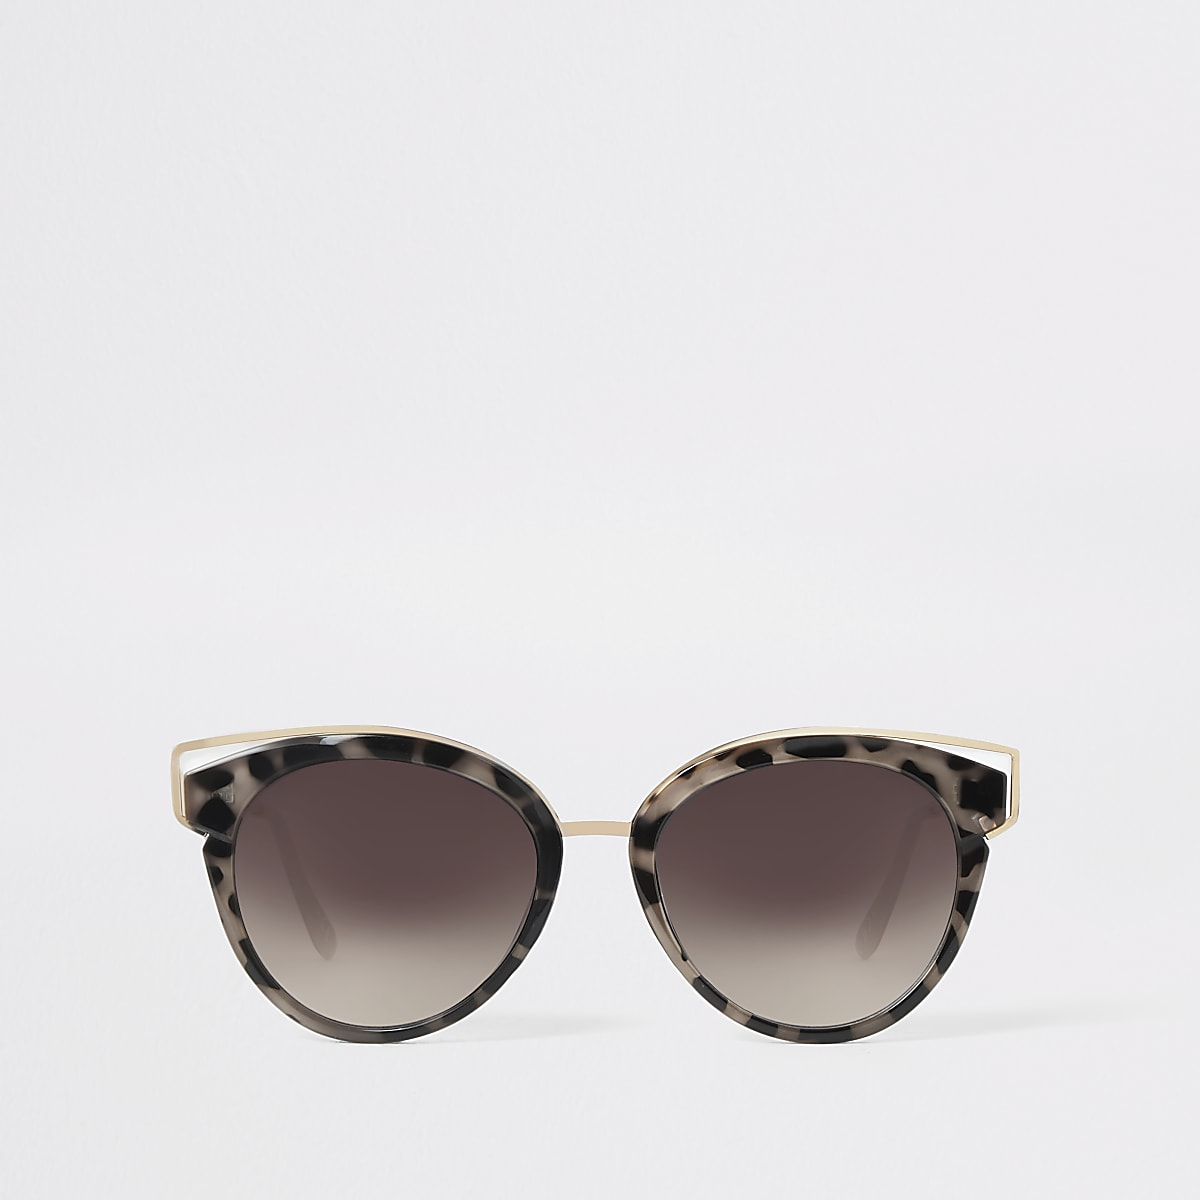 Caroline Flack brown cat eye sunglasses